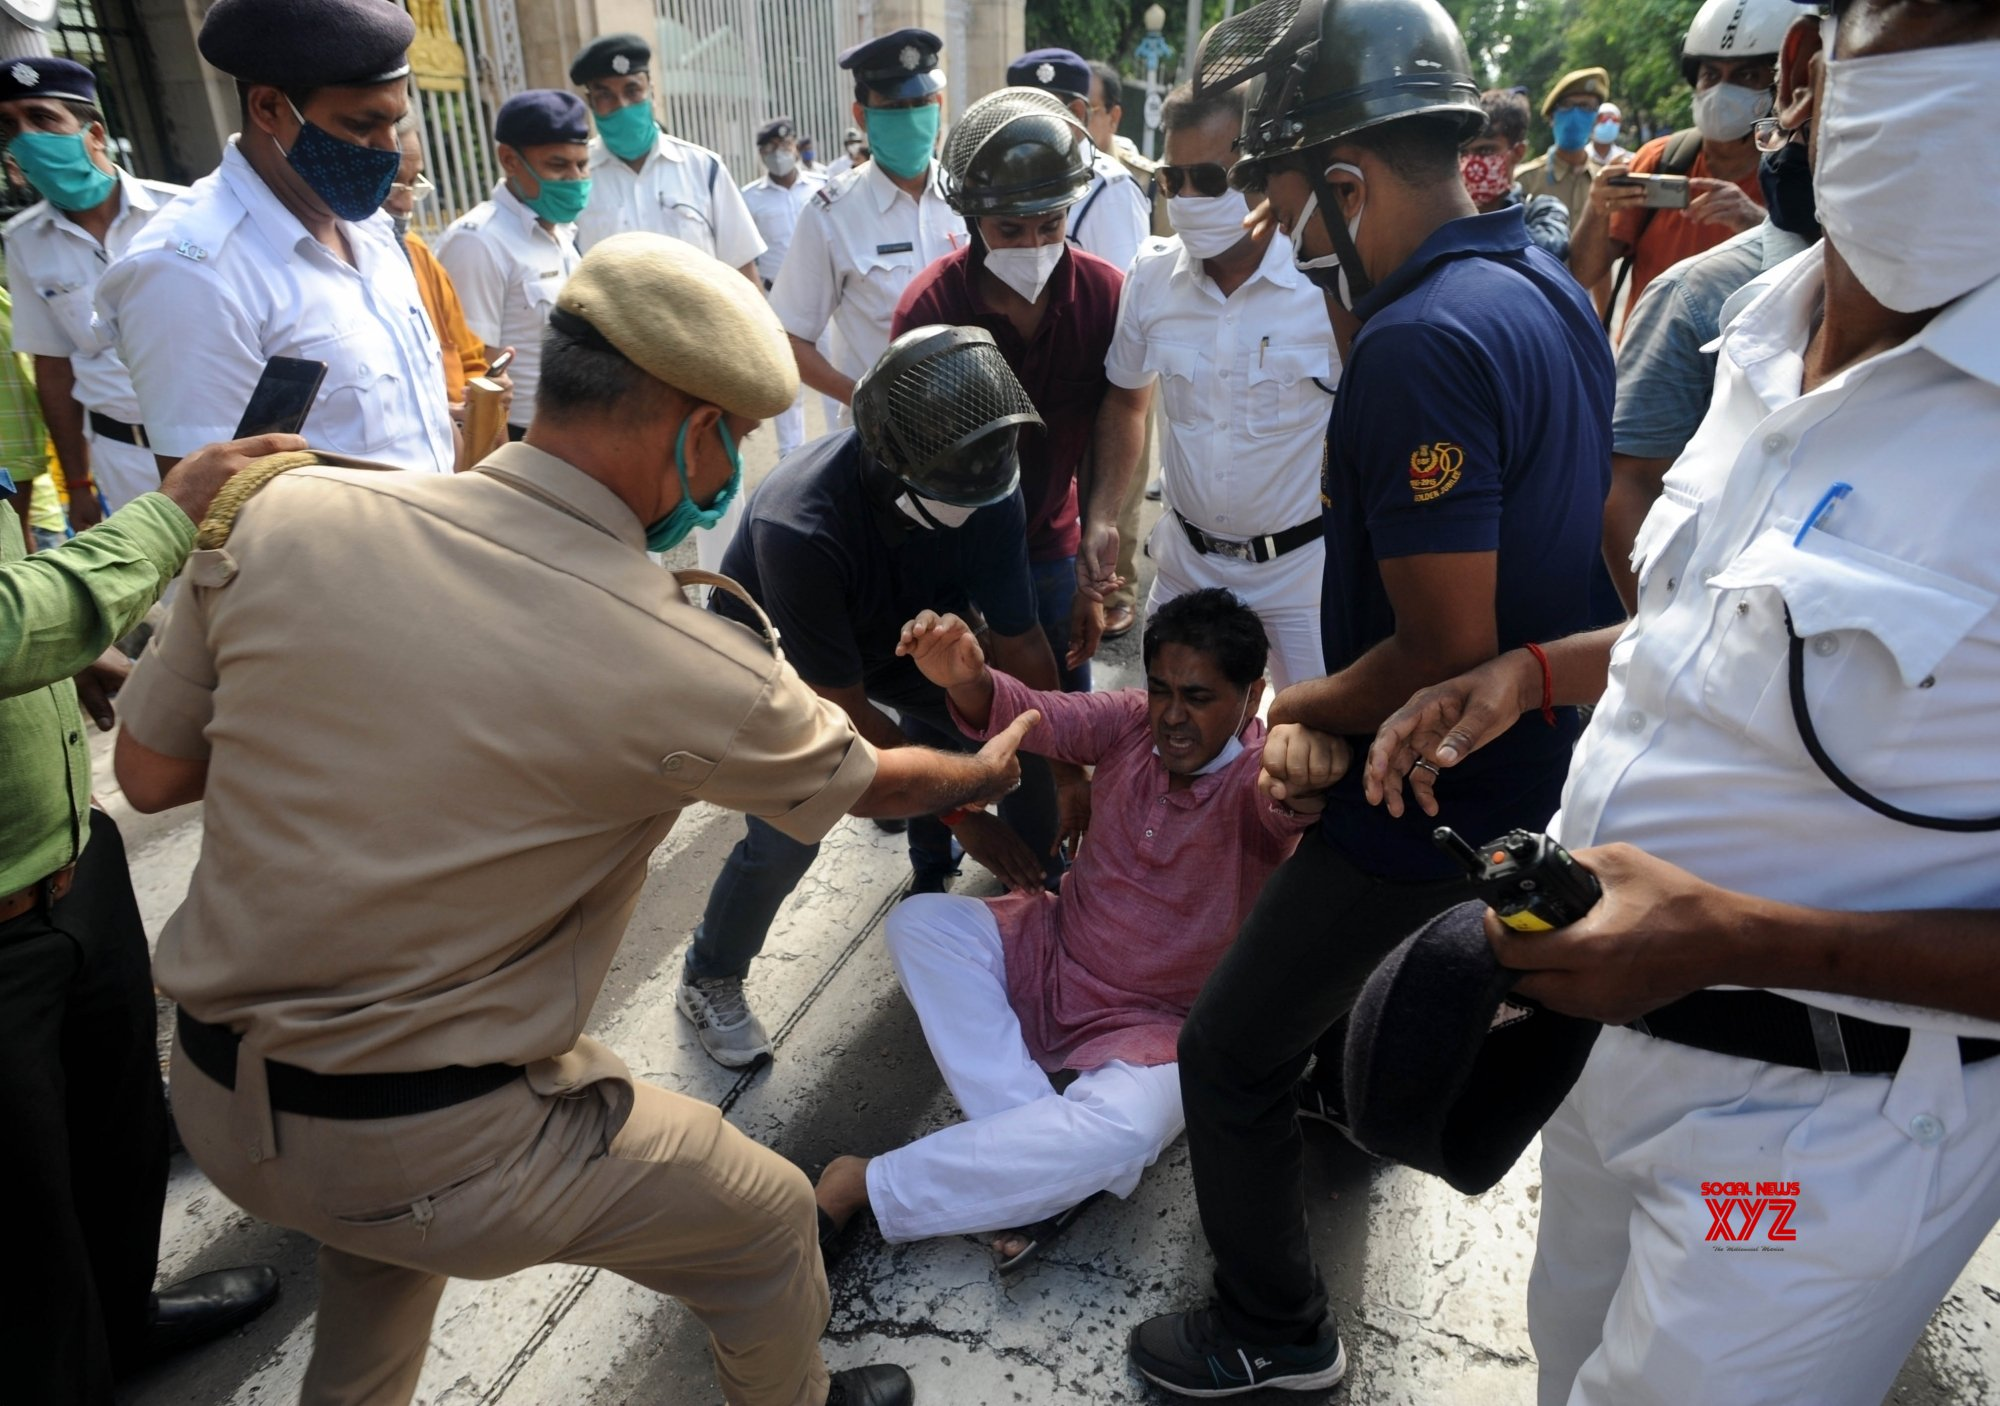 Kolkata: Congress activists agitated and protested over Pegasus project issue outside Raj Bhawan in Kolkata. #Gallery